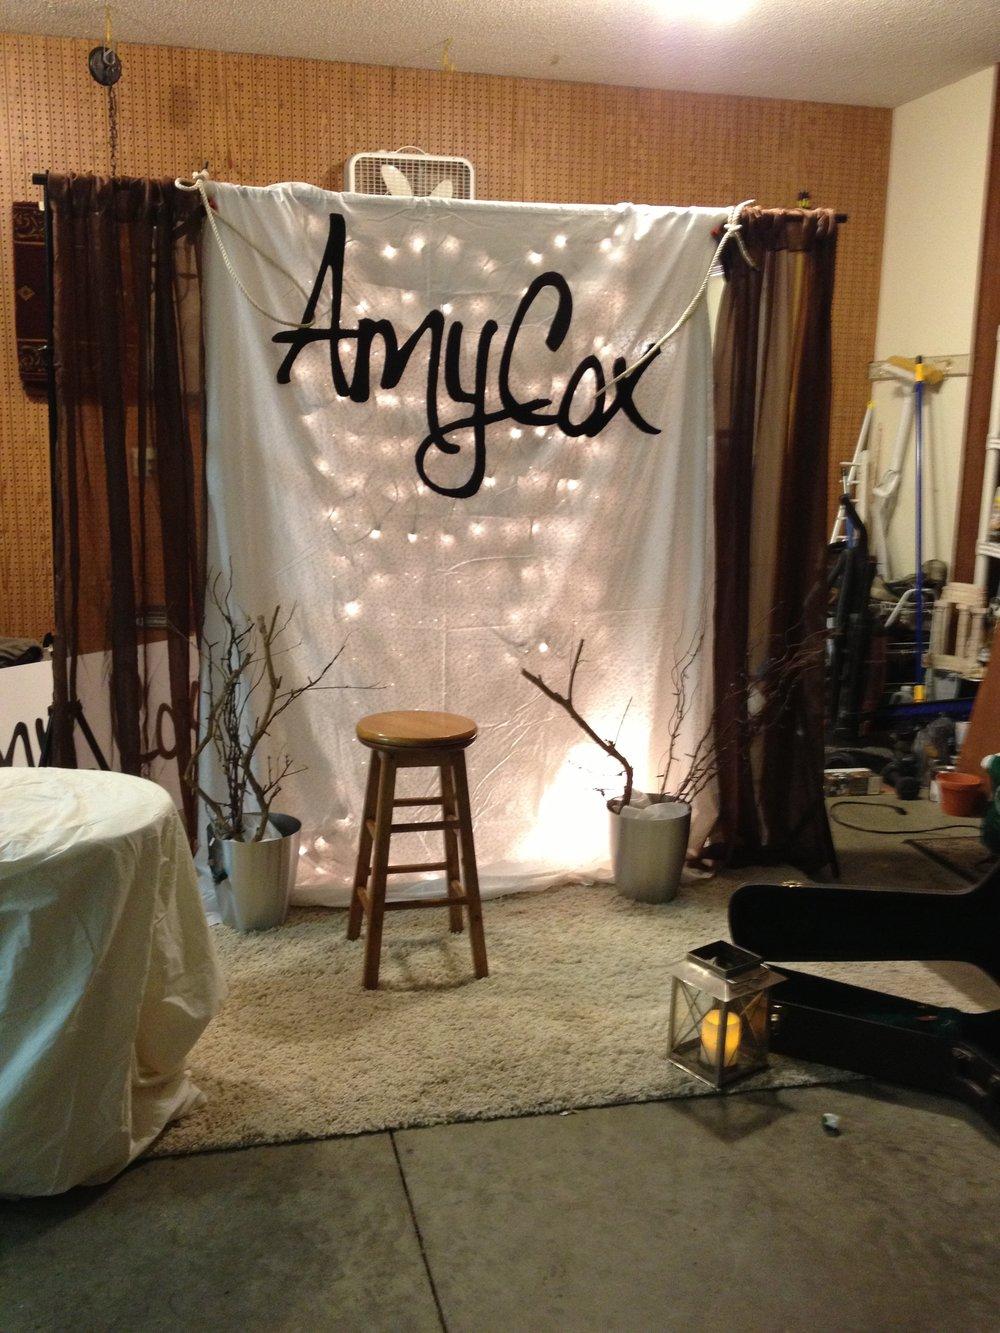 mock up garage amy cox backdrop.jpg